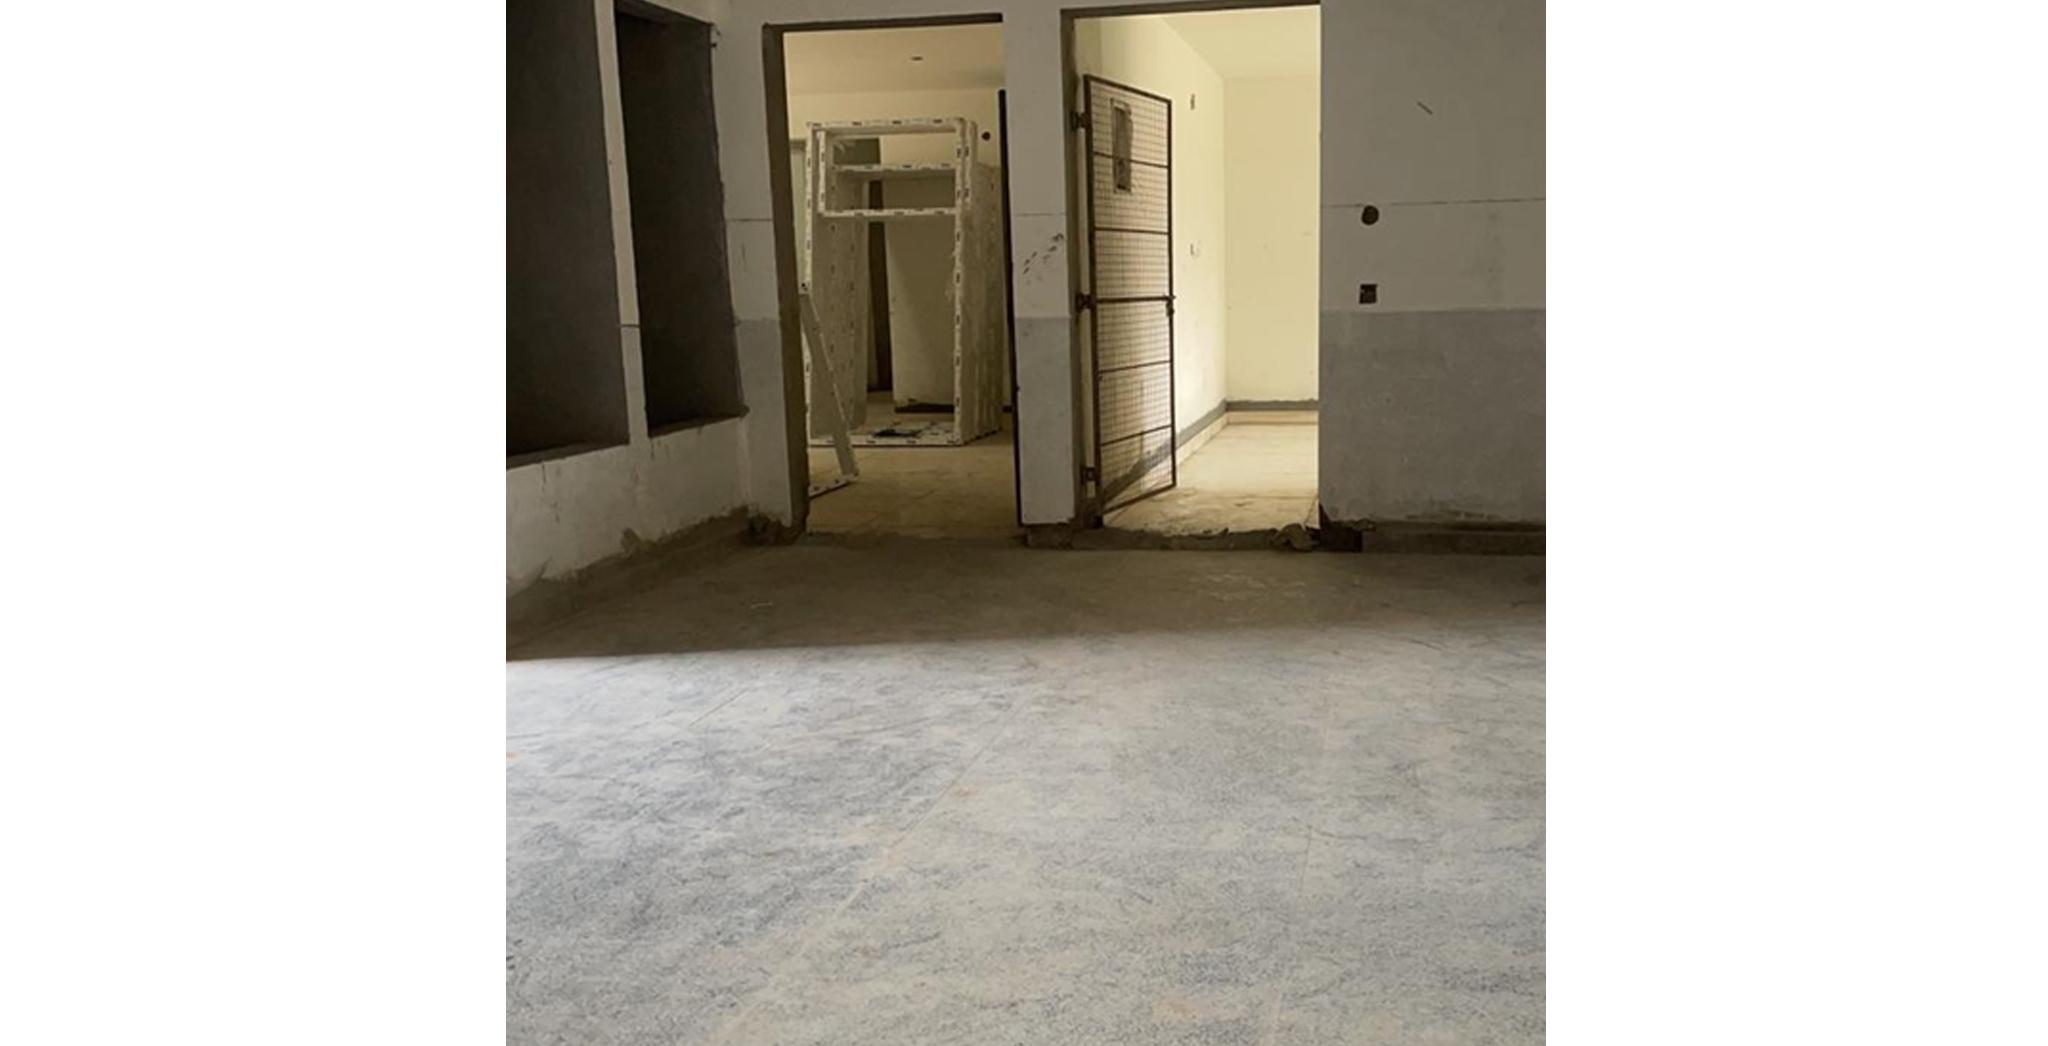 Aug 2021 - M Block: Ground floor lobby Flooring work in progress